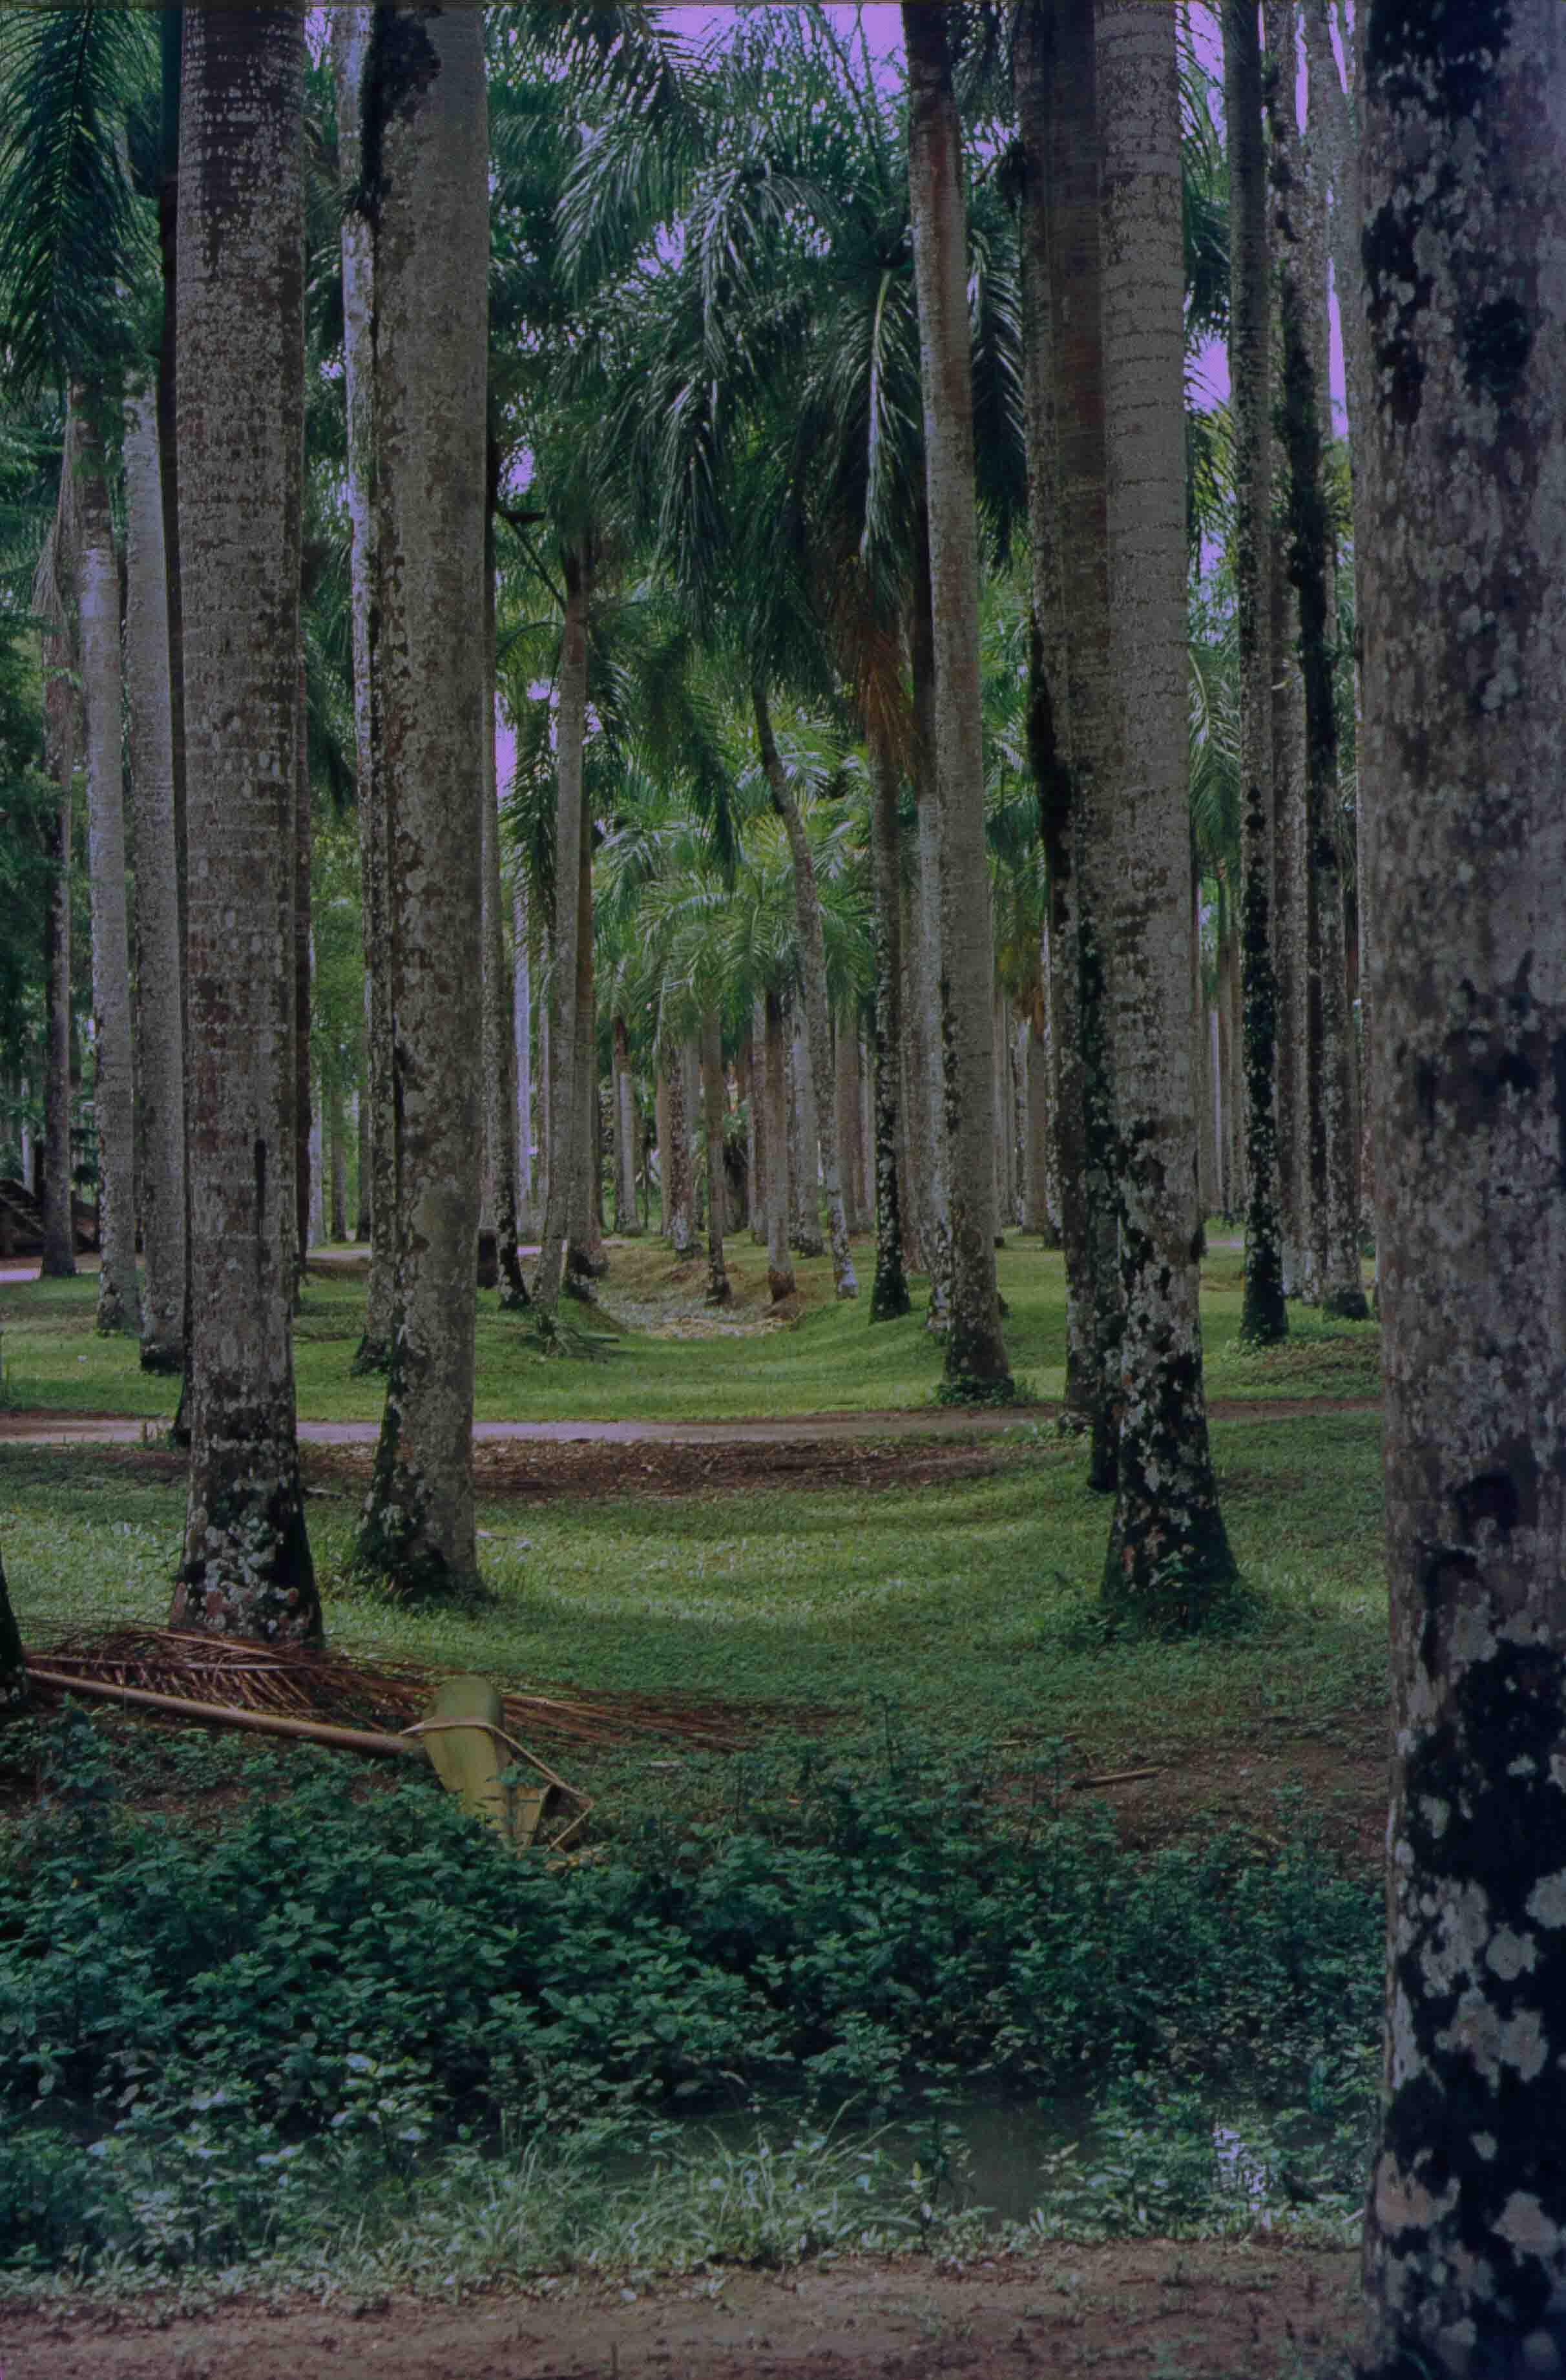 247. Suriname